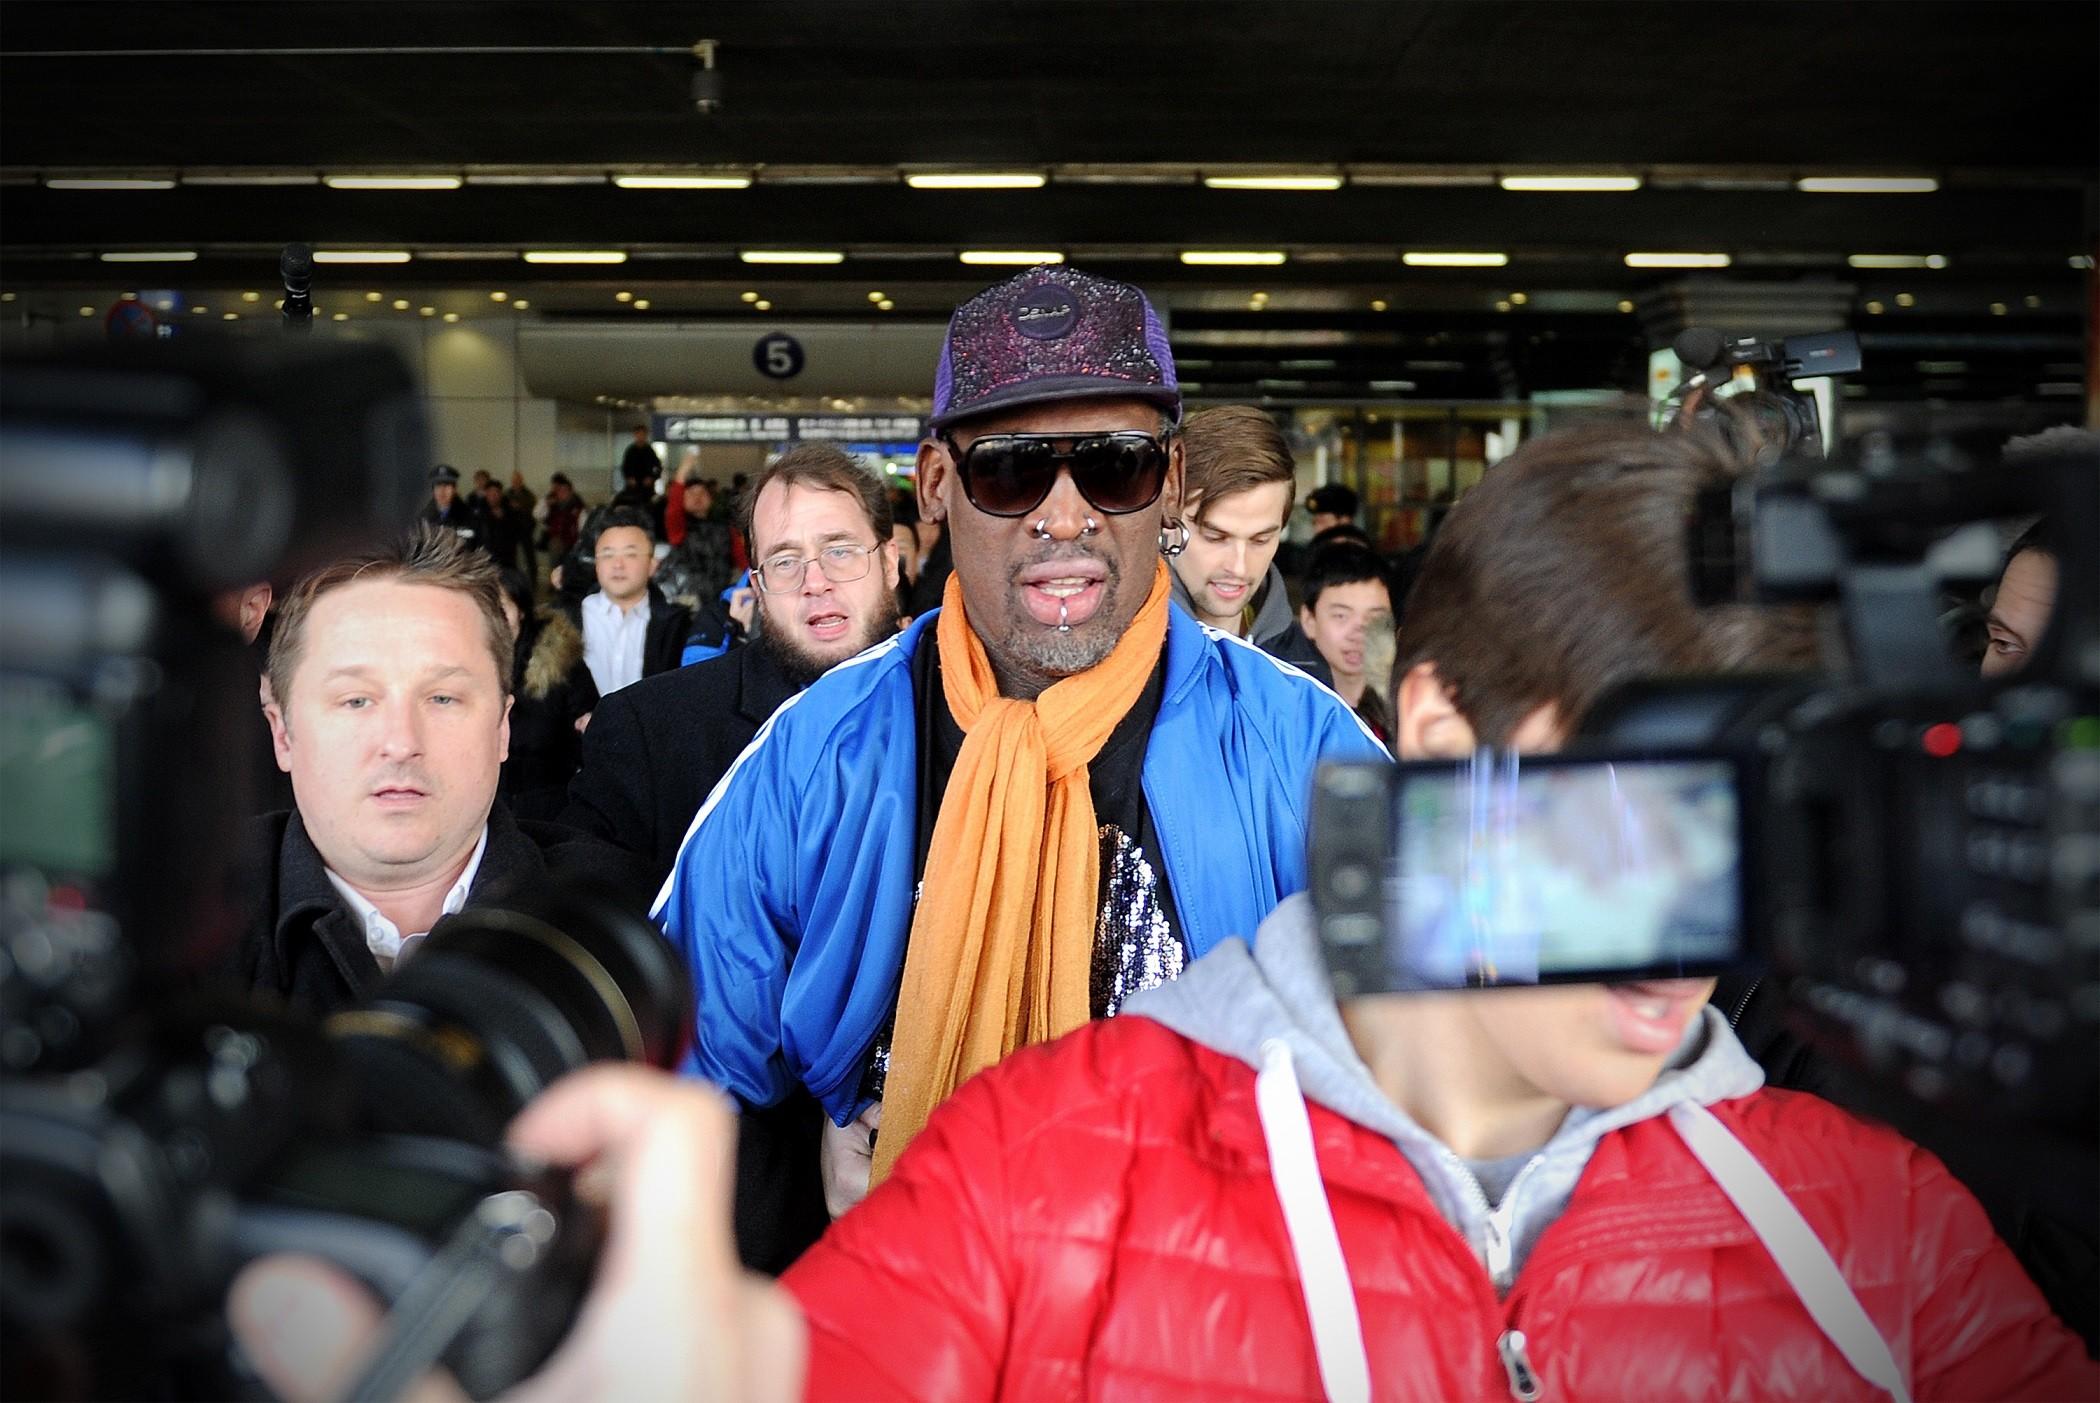 Dennis Rodman leaving North Korea